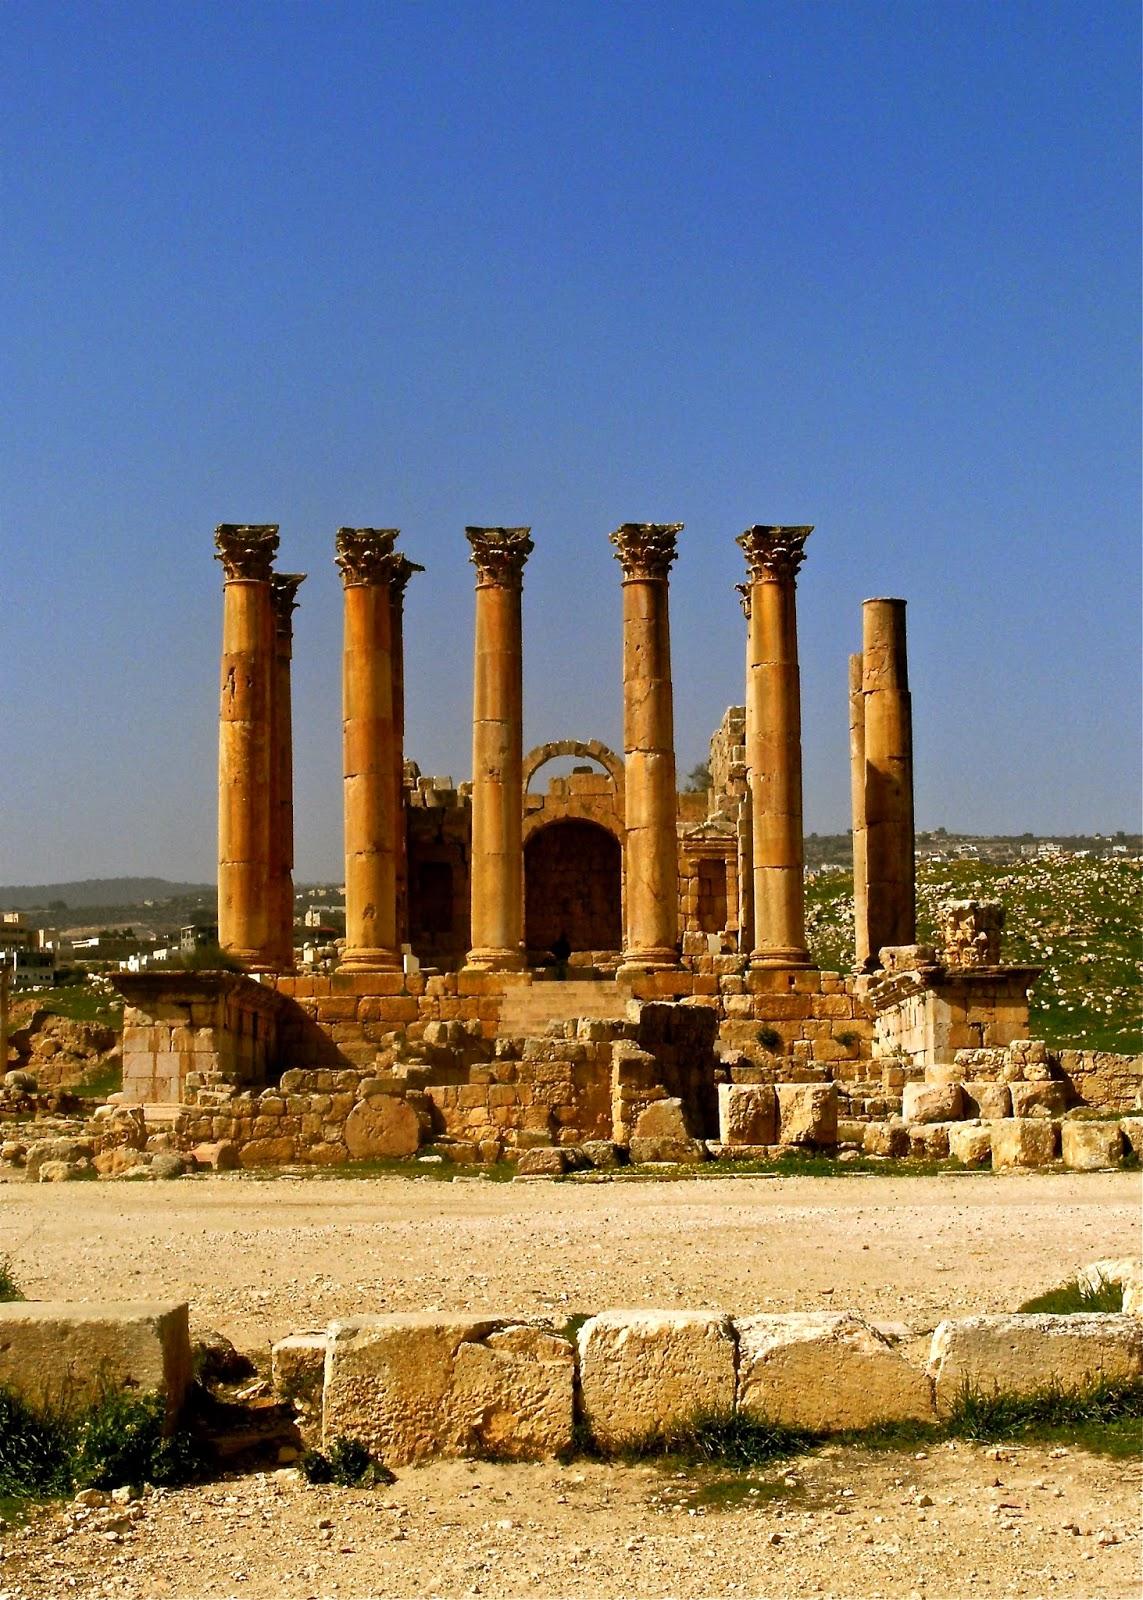 THE TEMPLE OF ARTEMIS AT EPHESUS  XAMOWALLPAPERS.BLOGSPOT.COM